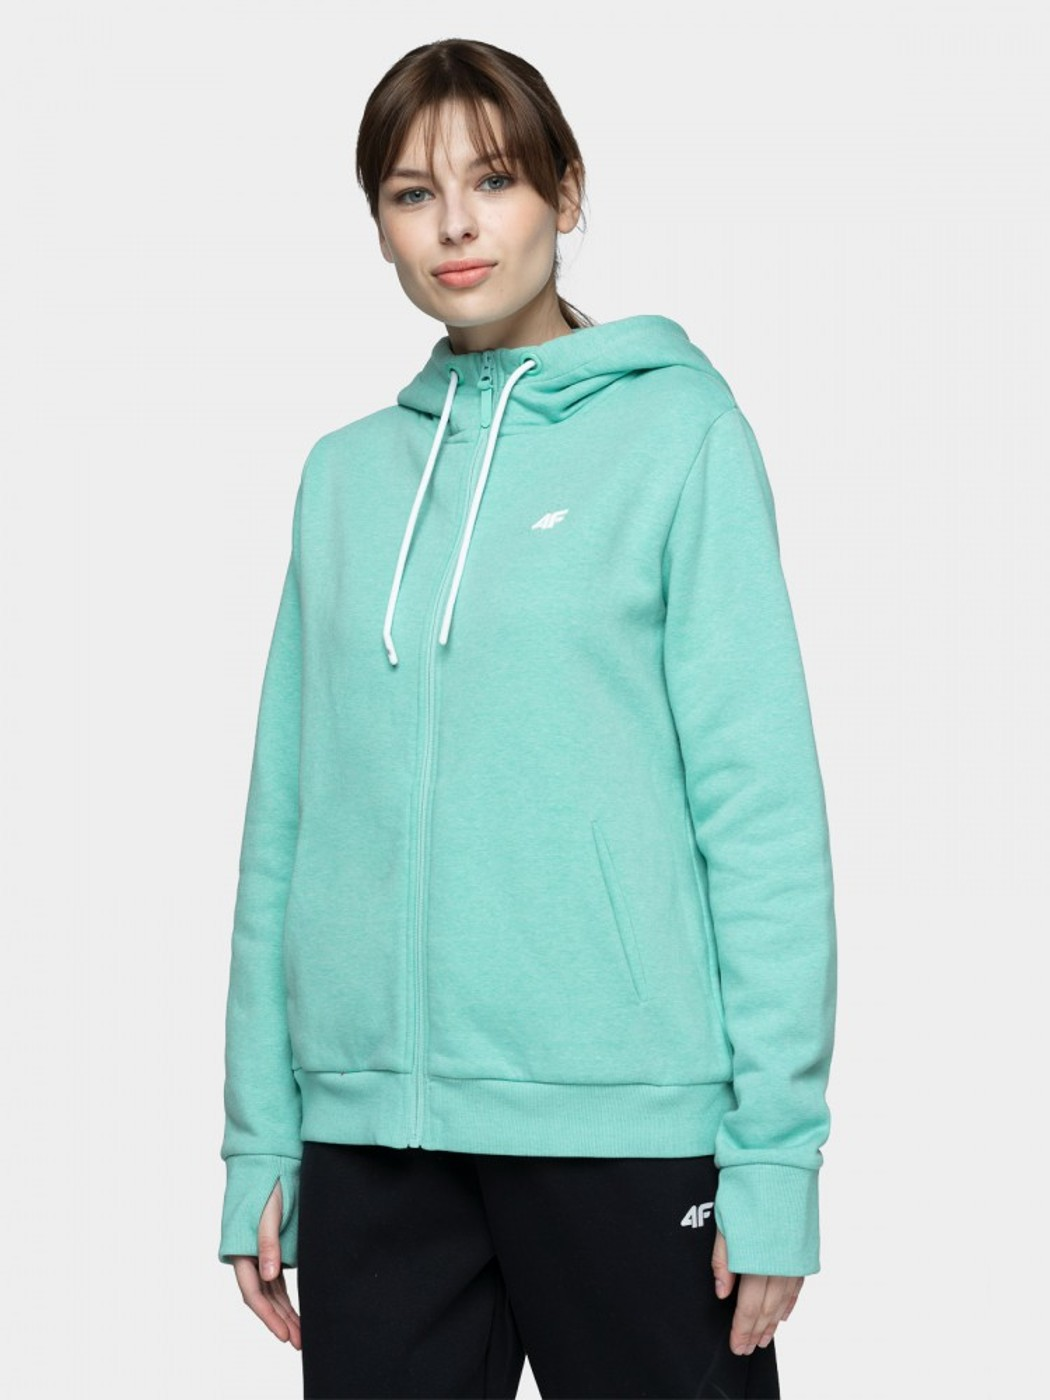 4F BLD004 Sweatshirt - Damen